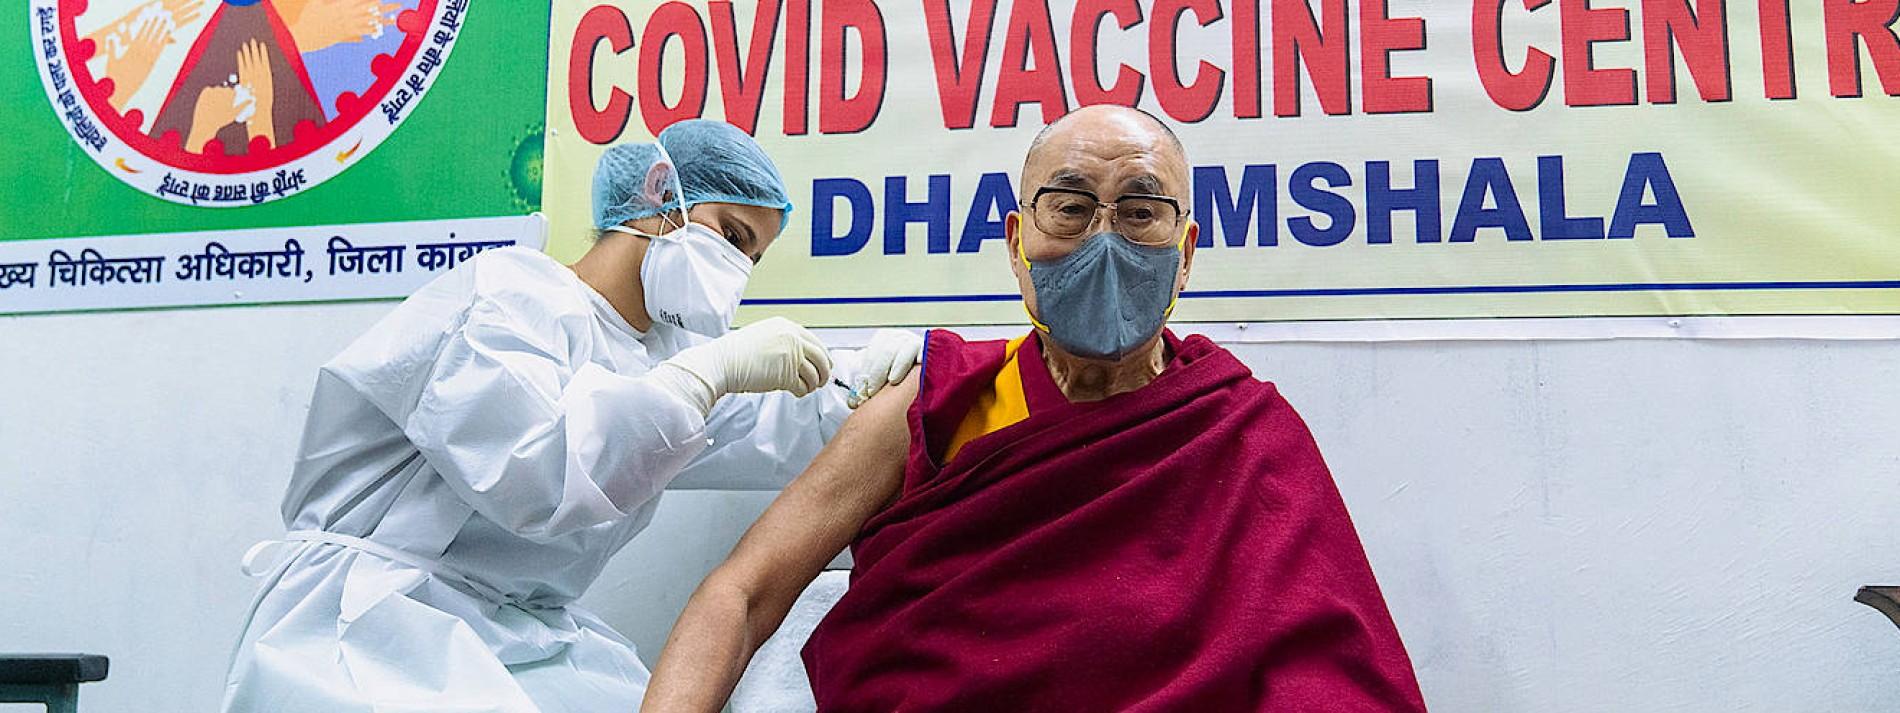 Dalai Lama erhält erste Impfung mit Astra-Zeneca